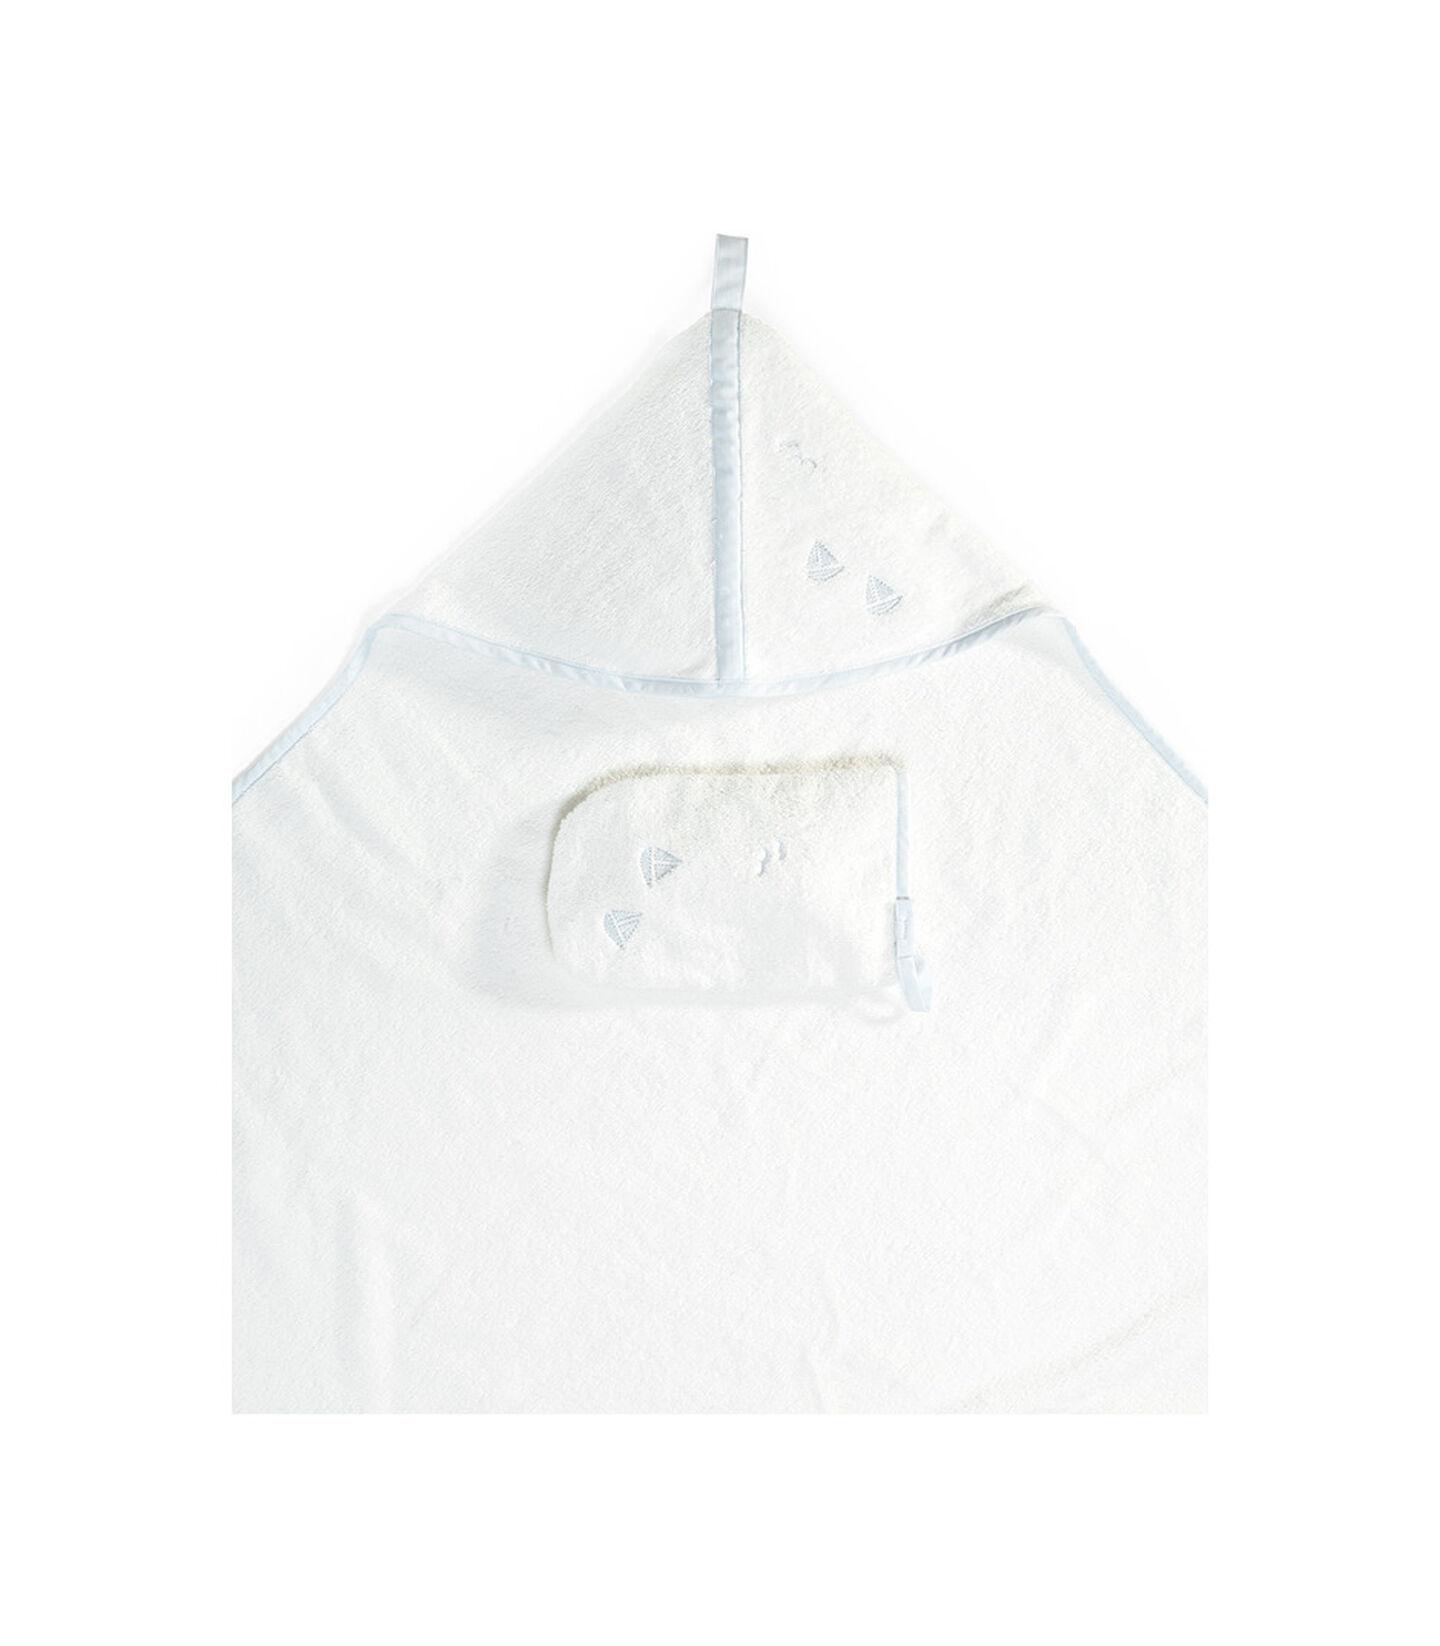 Stokke® Hooded Towel Blue Sea, Blue Sea, mainview view 1